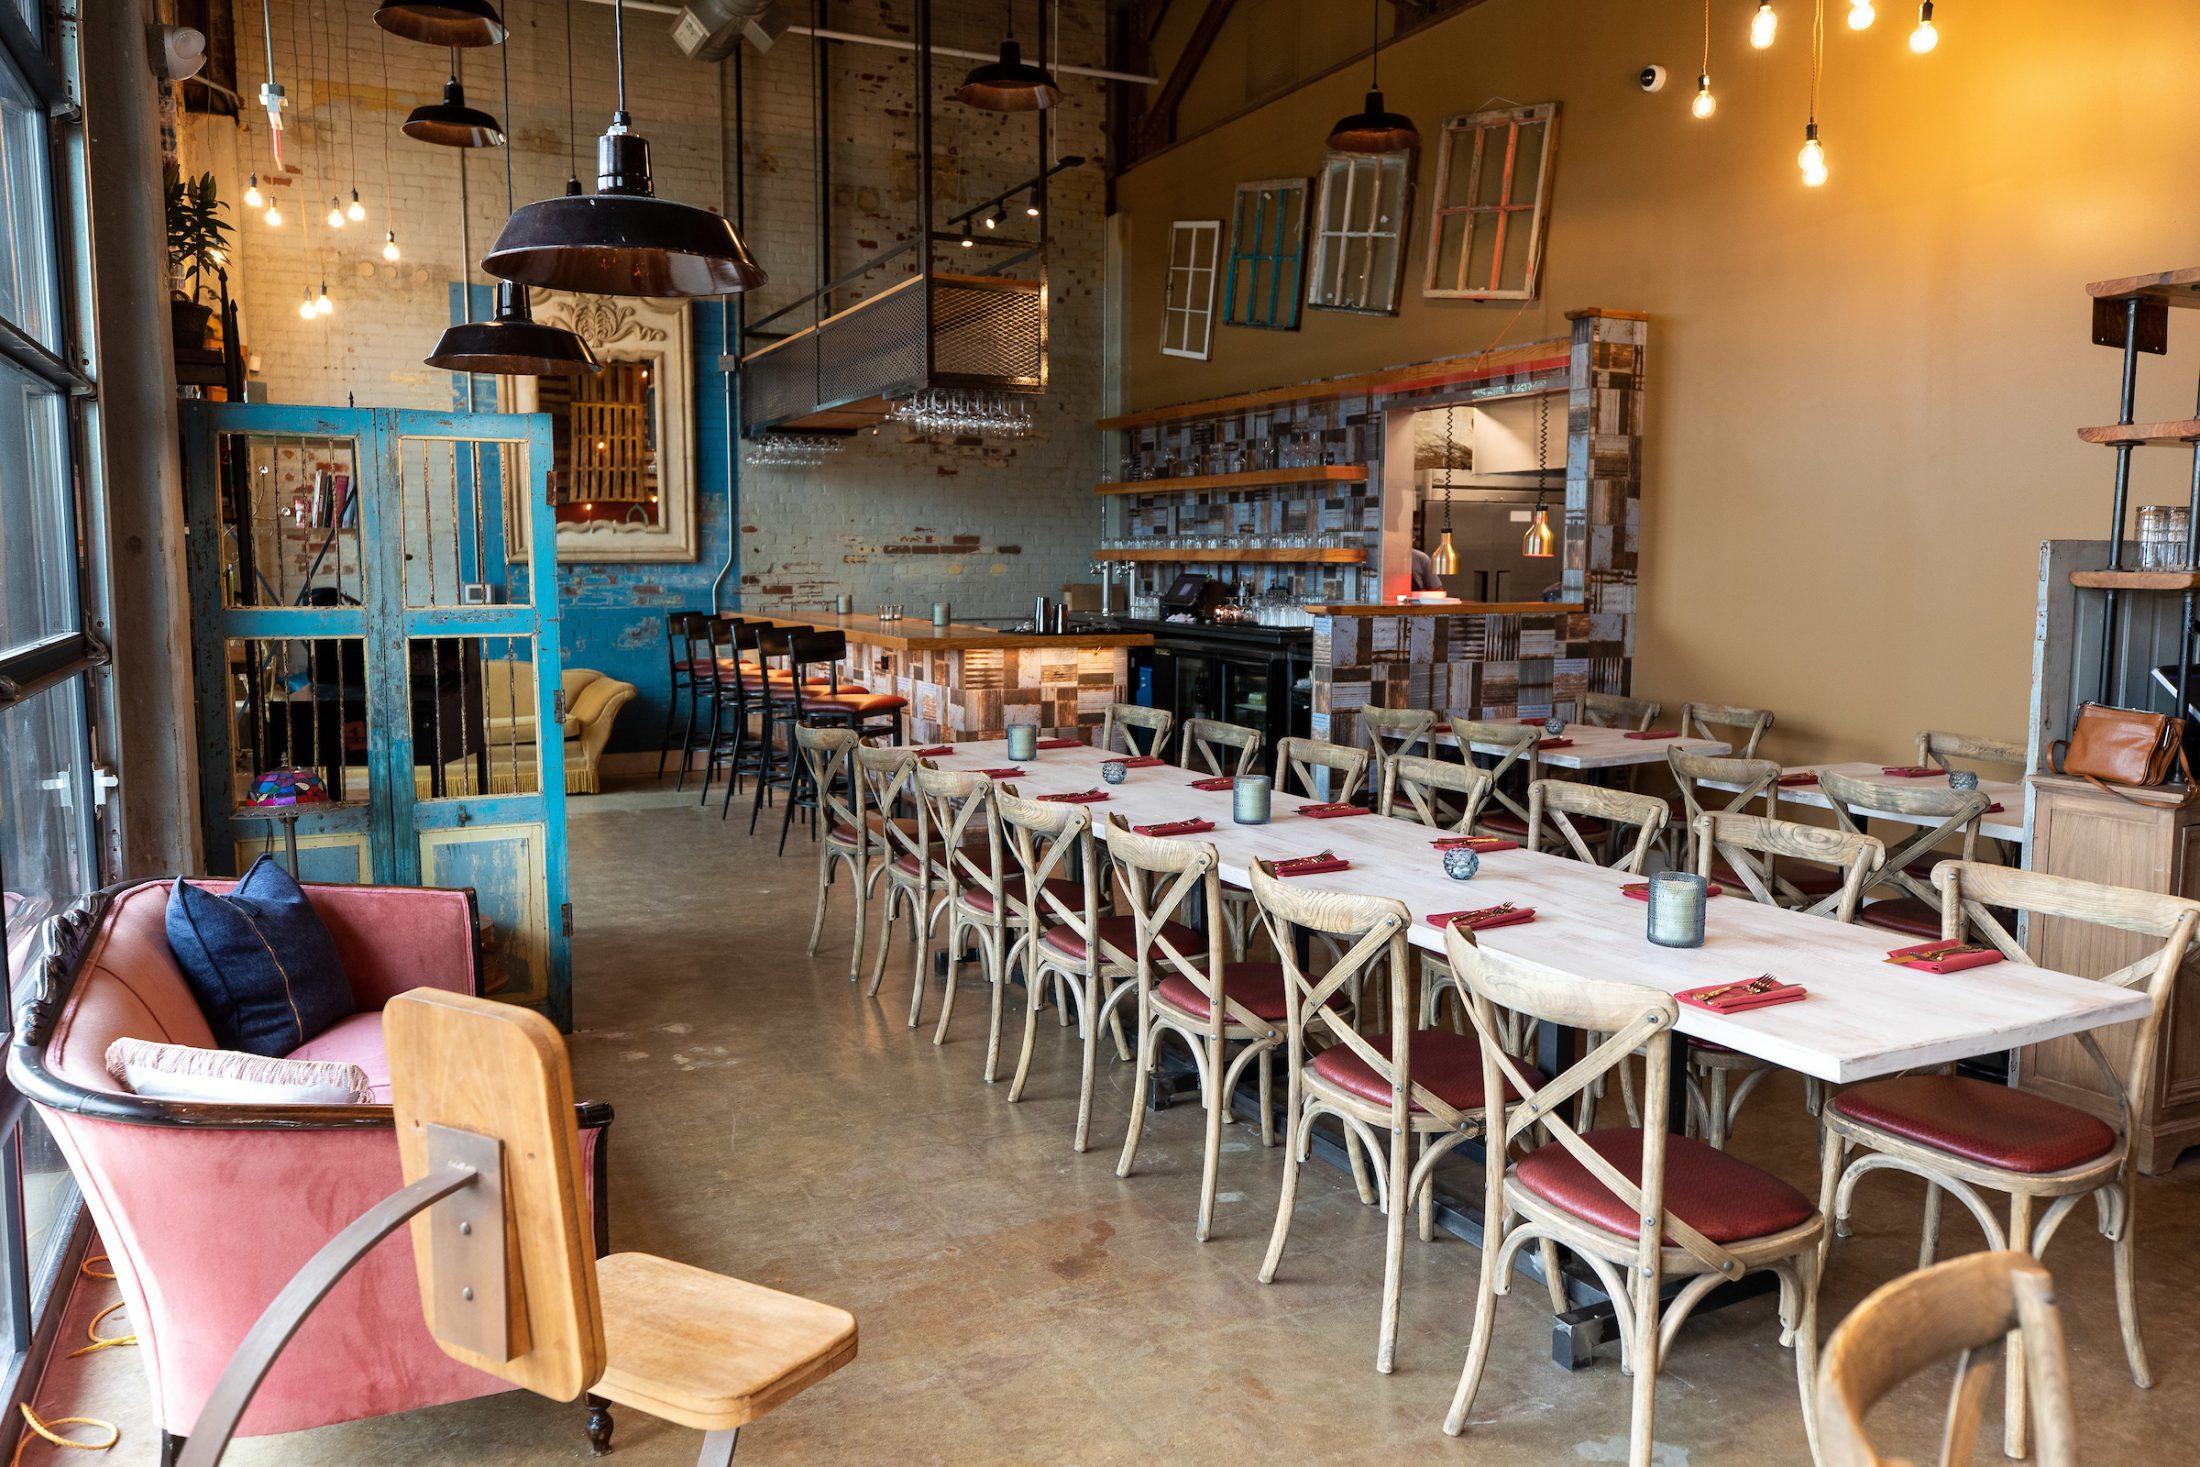 black owned restaurants shifting focus